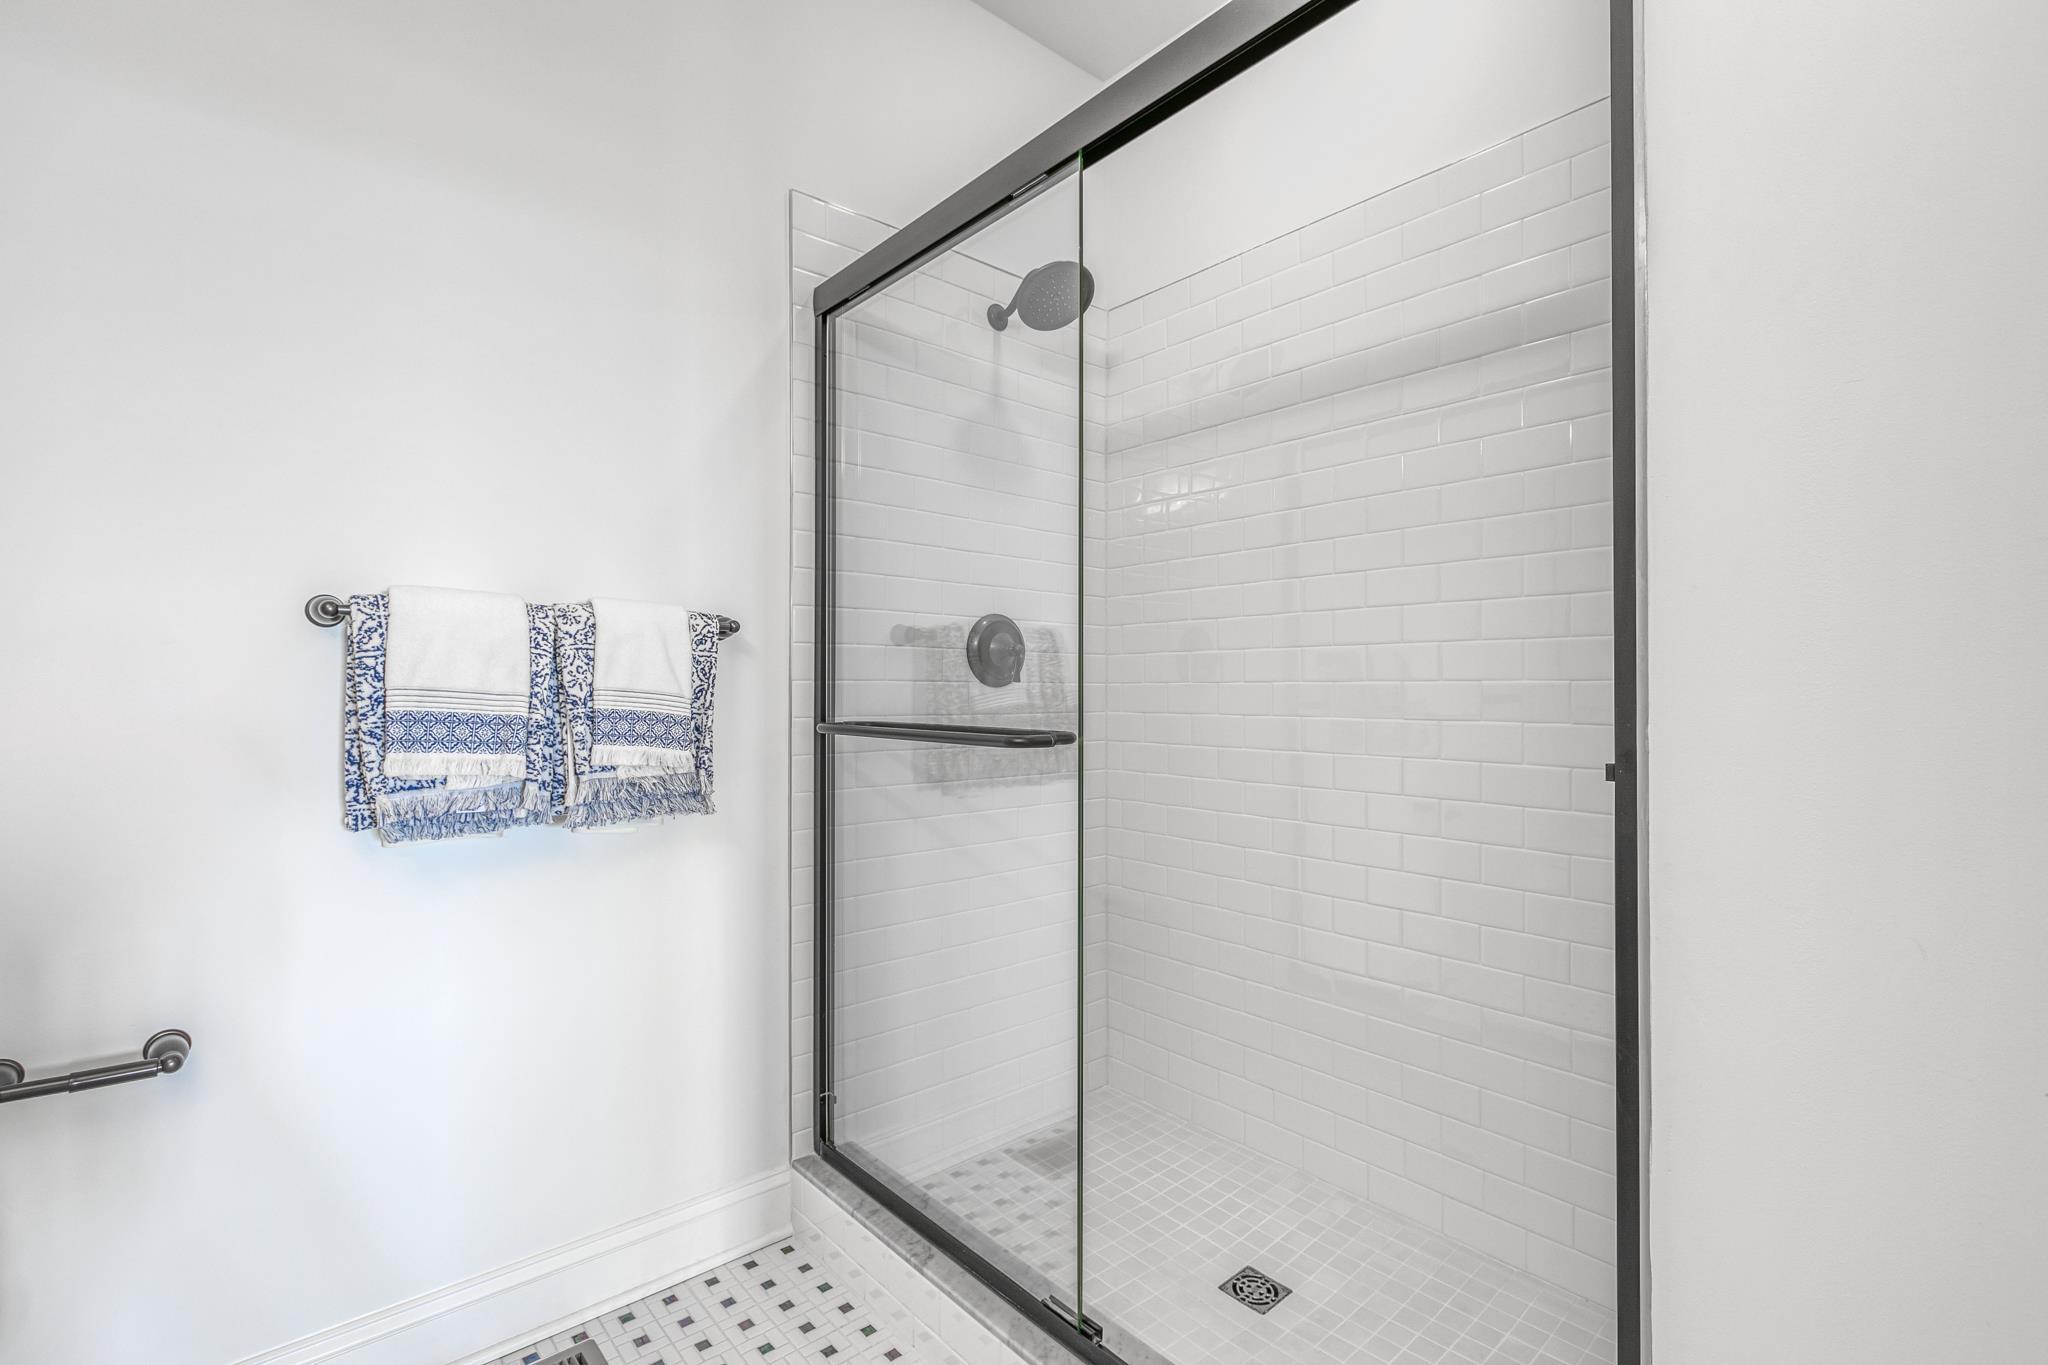 Bathroom featured in The Laurel By McKee Builders in Eastern Shore, MD